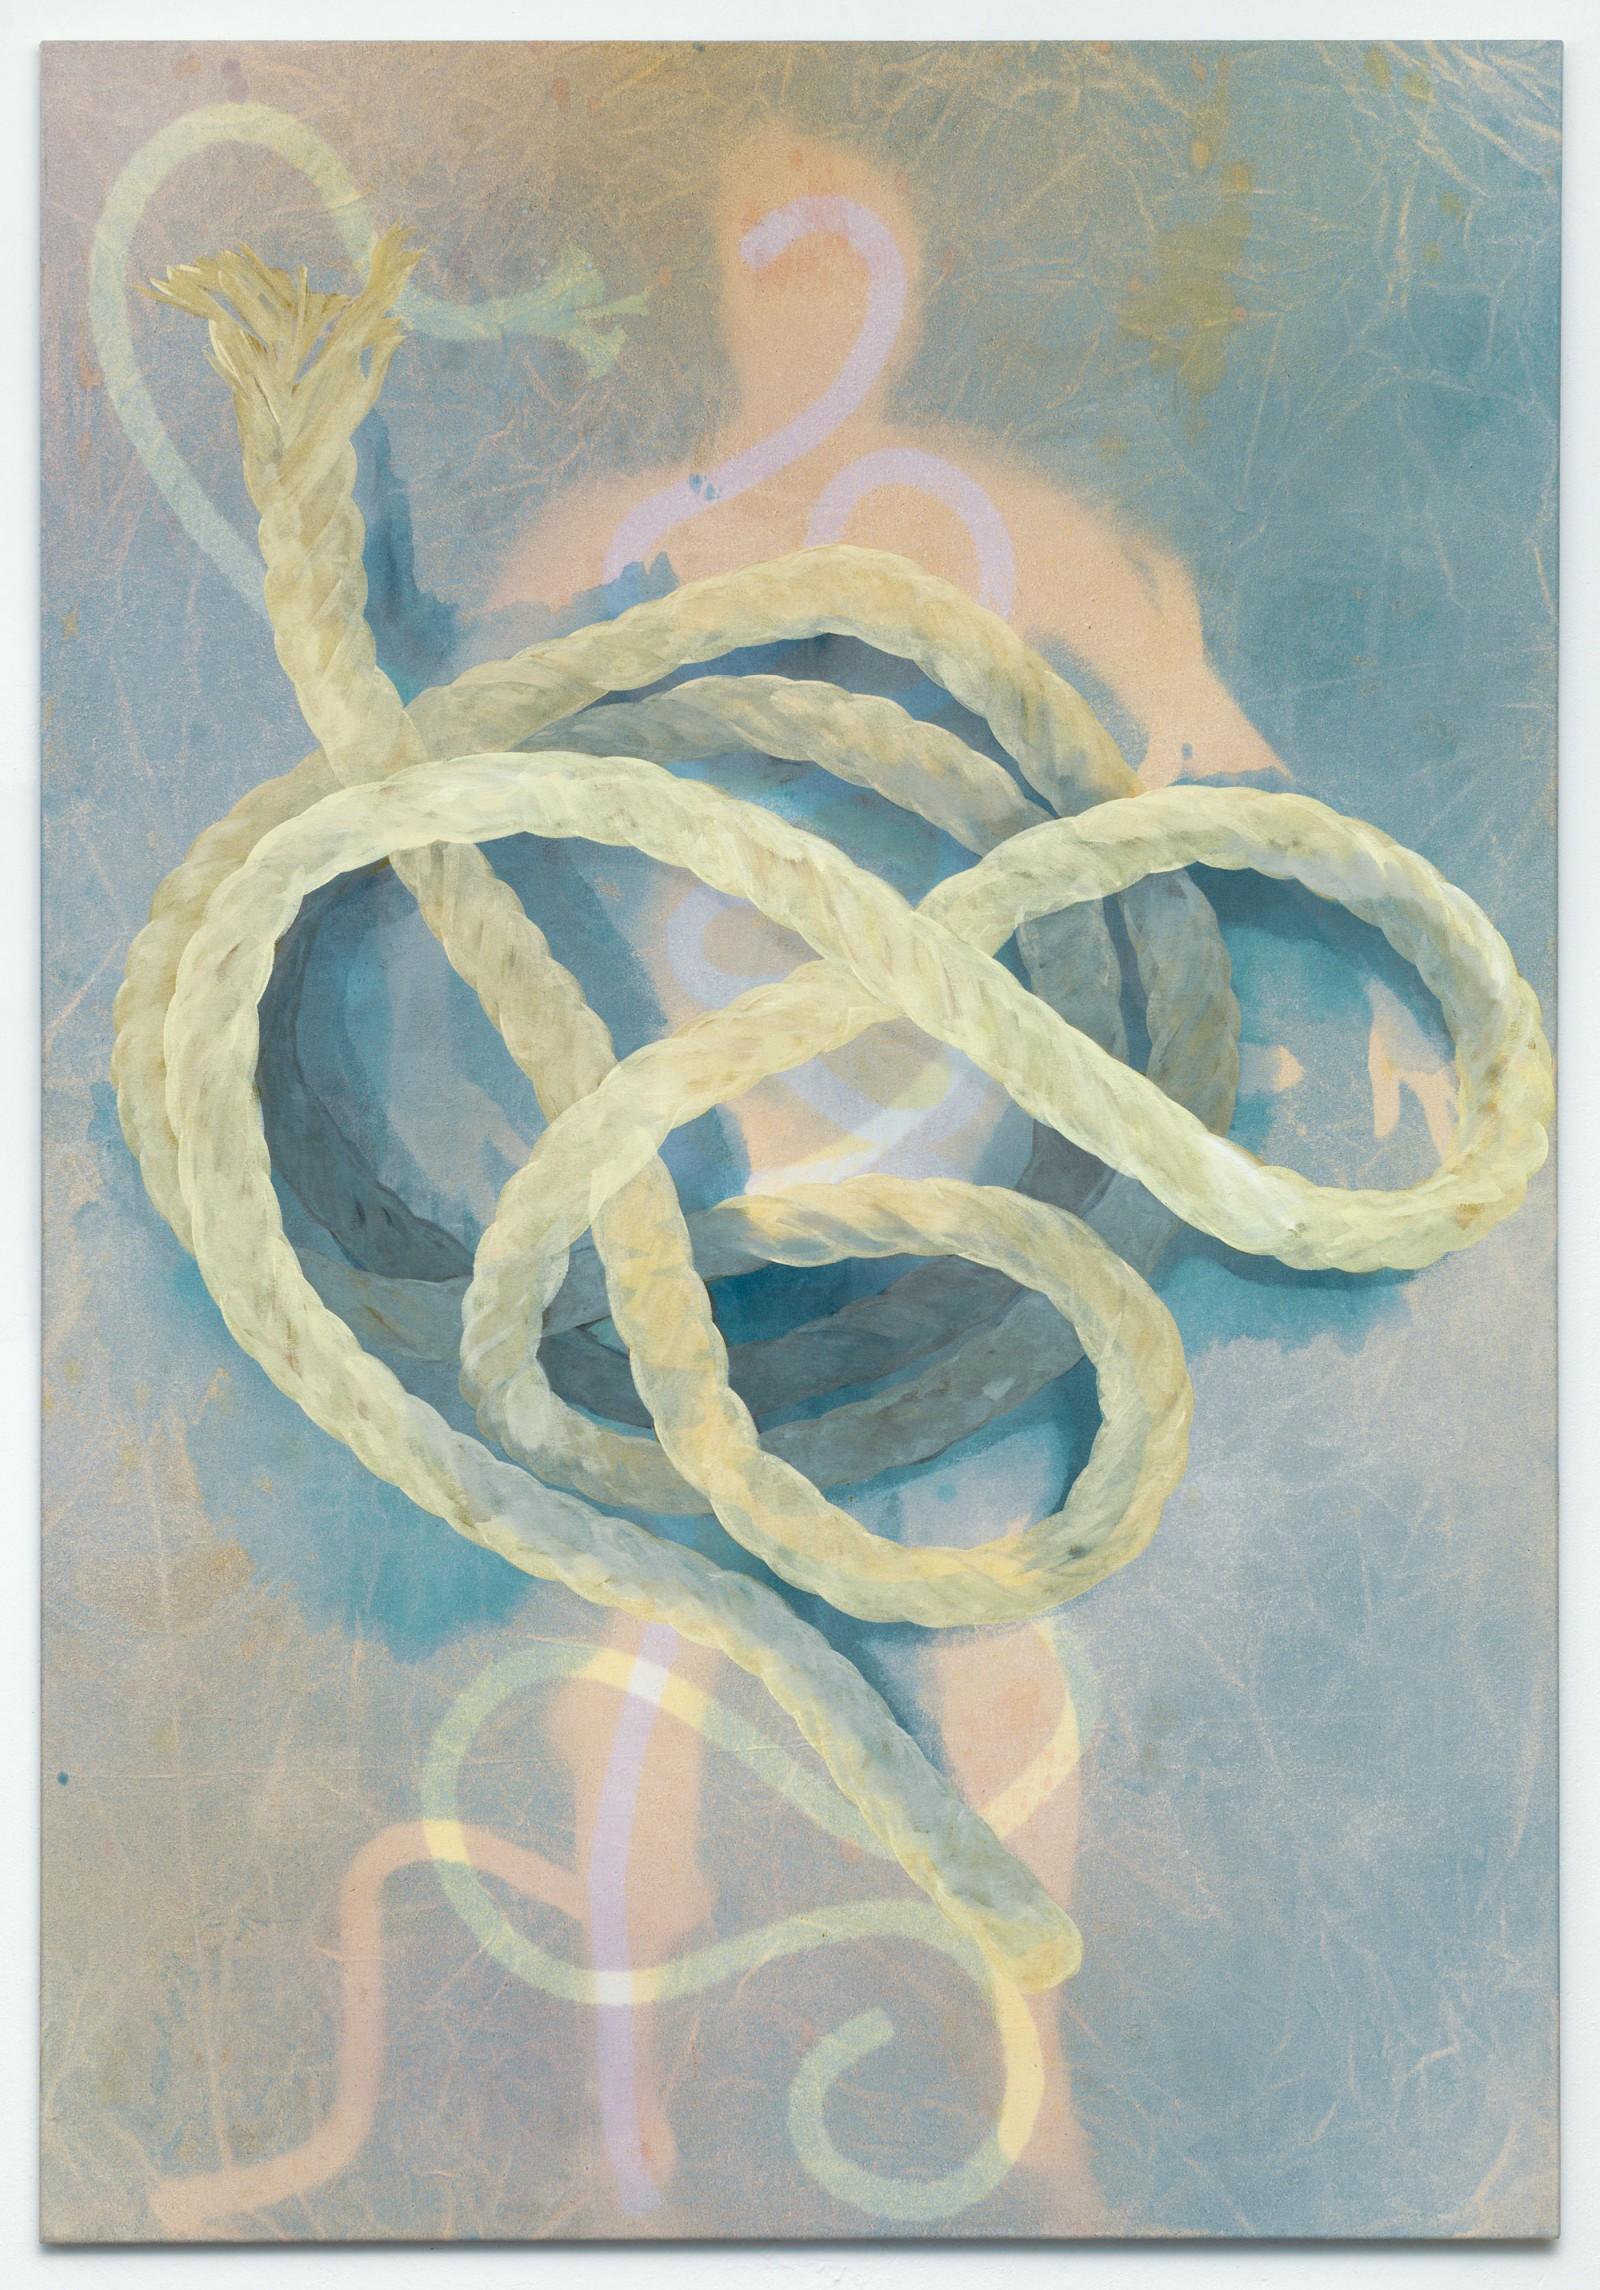 Kim Nekarda: untitled (kanopen), 2010, vinyl color & body print on cotton, 200 x 140 cm